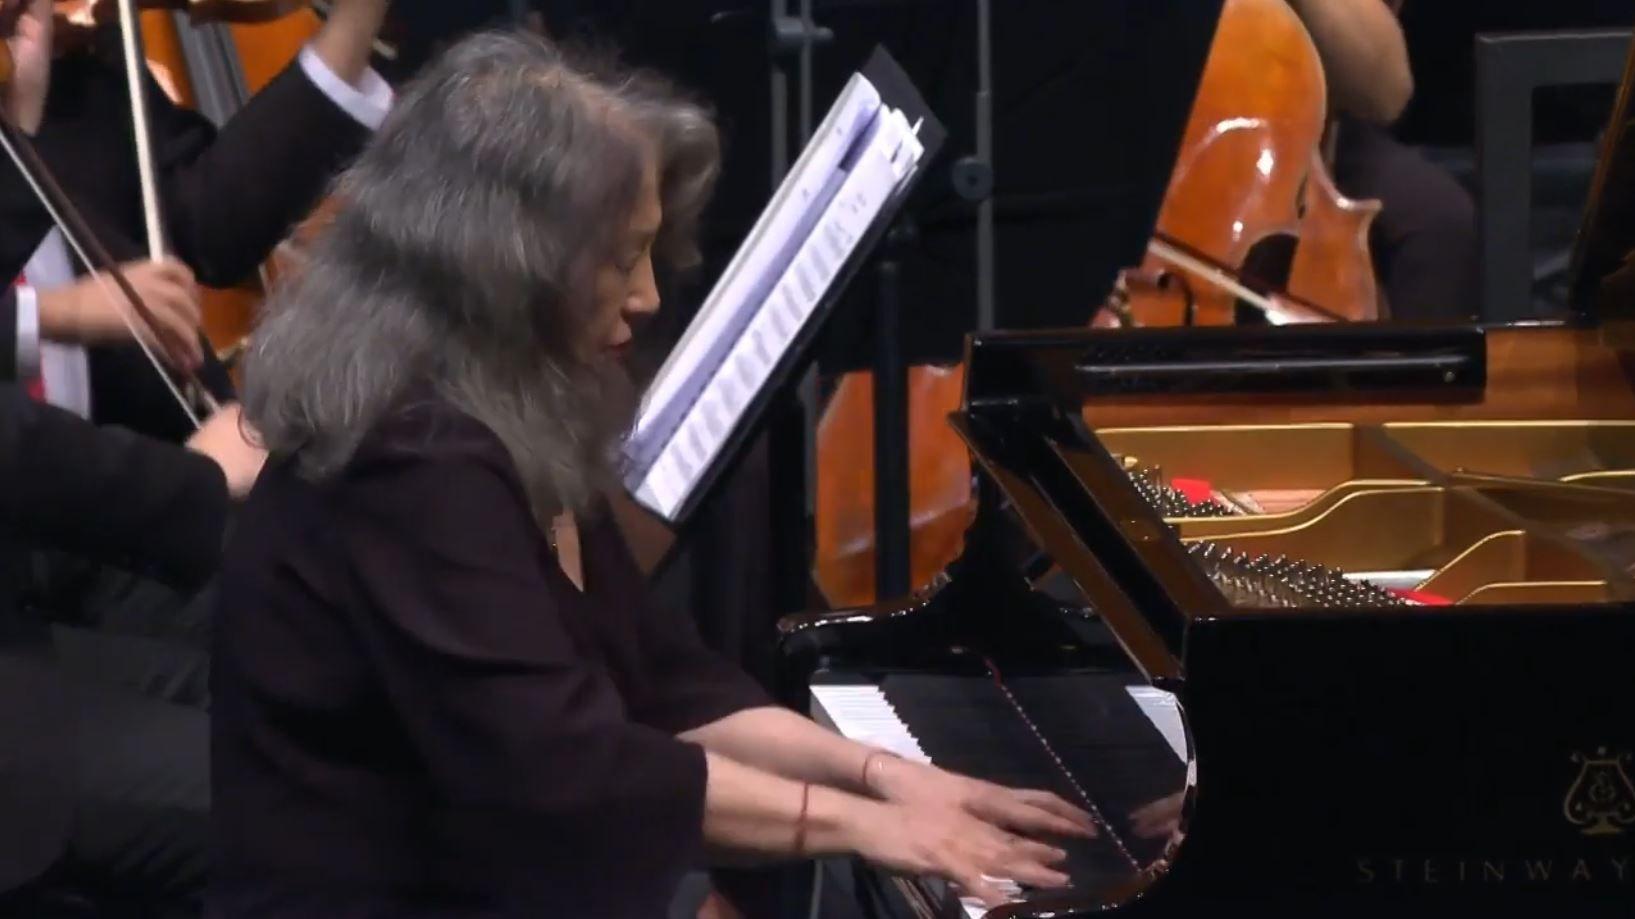 Pyotr Ilyich Tchaikovsky Piano Concerto No 1 In B Flat Minor Martha Argerich West Eastern Divan Orchestra Daniel Barenboim Piano Orchestra Classical Music